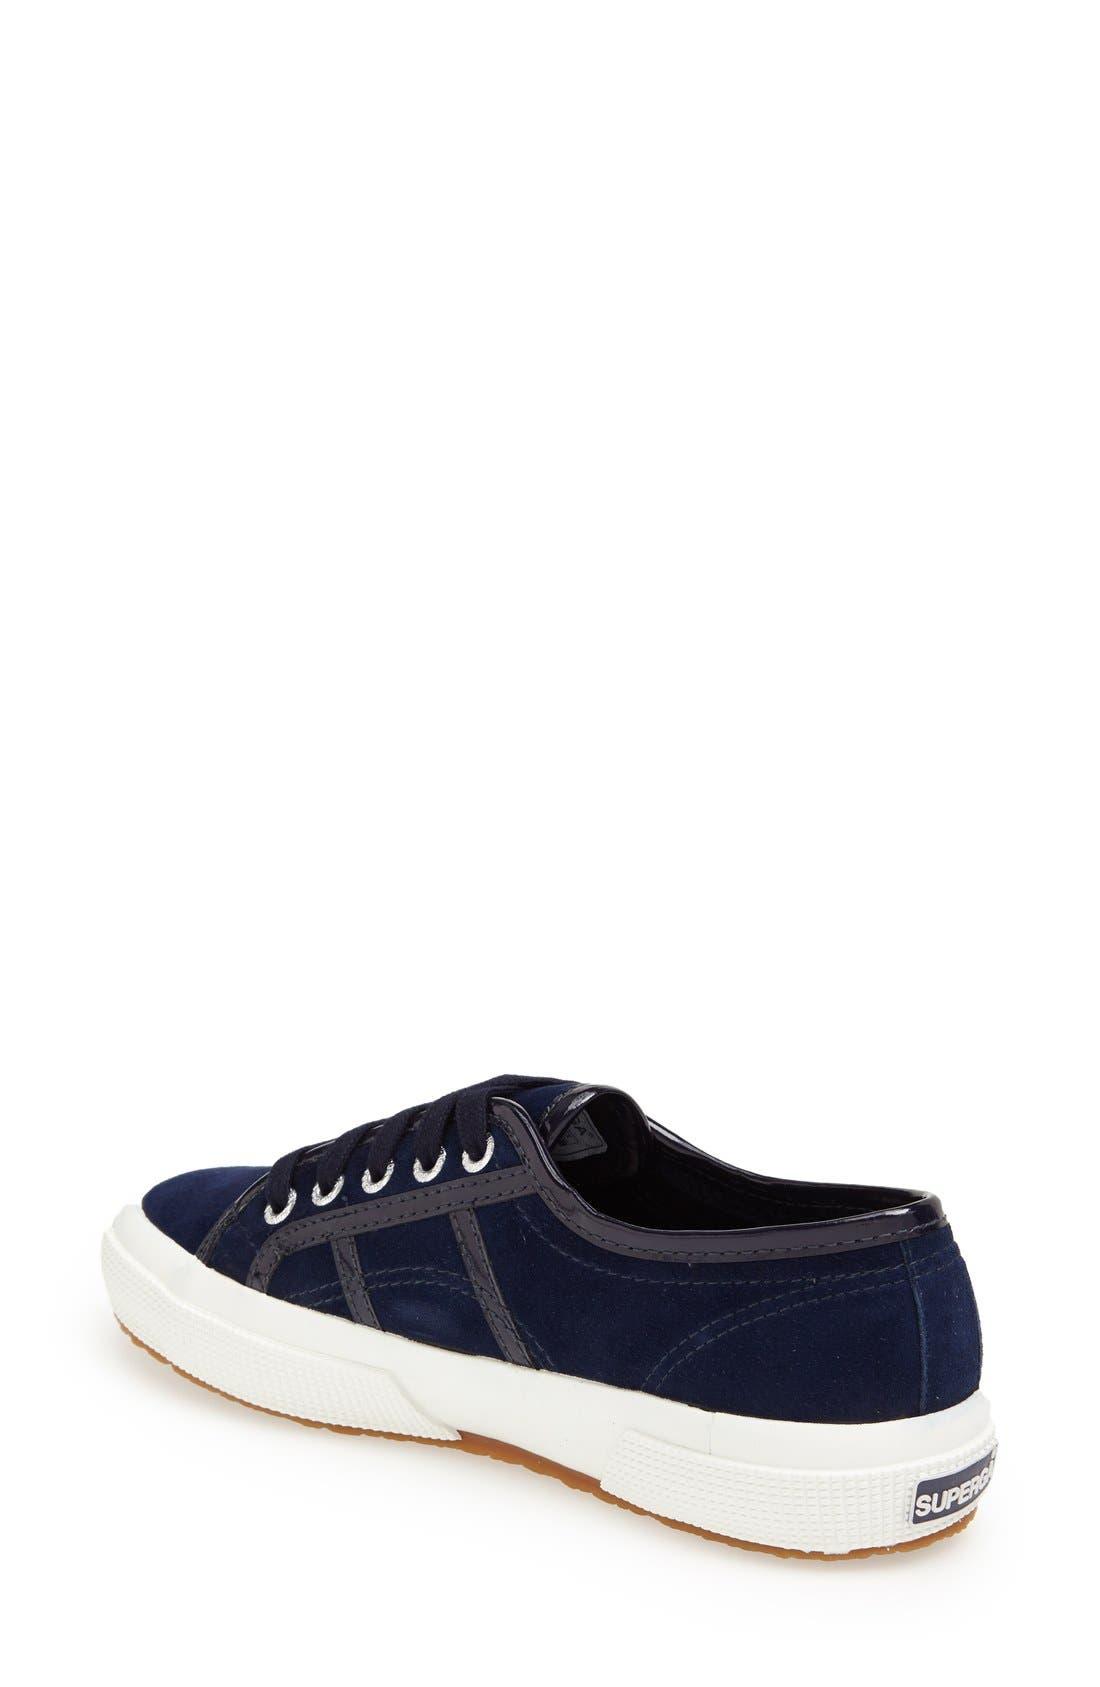 Alternate Image 2  - Superga Suede Slip-On Sneaker (Women)